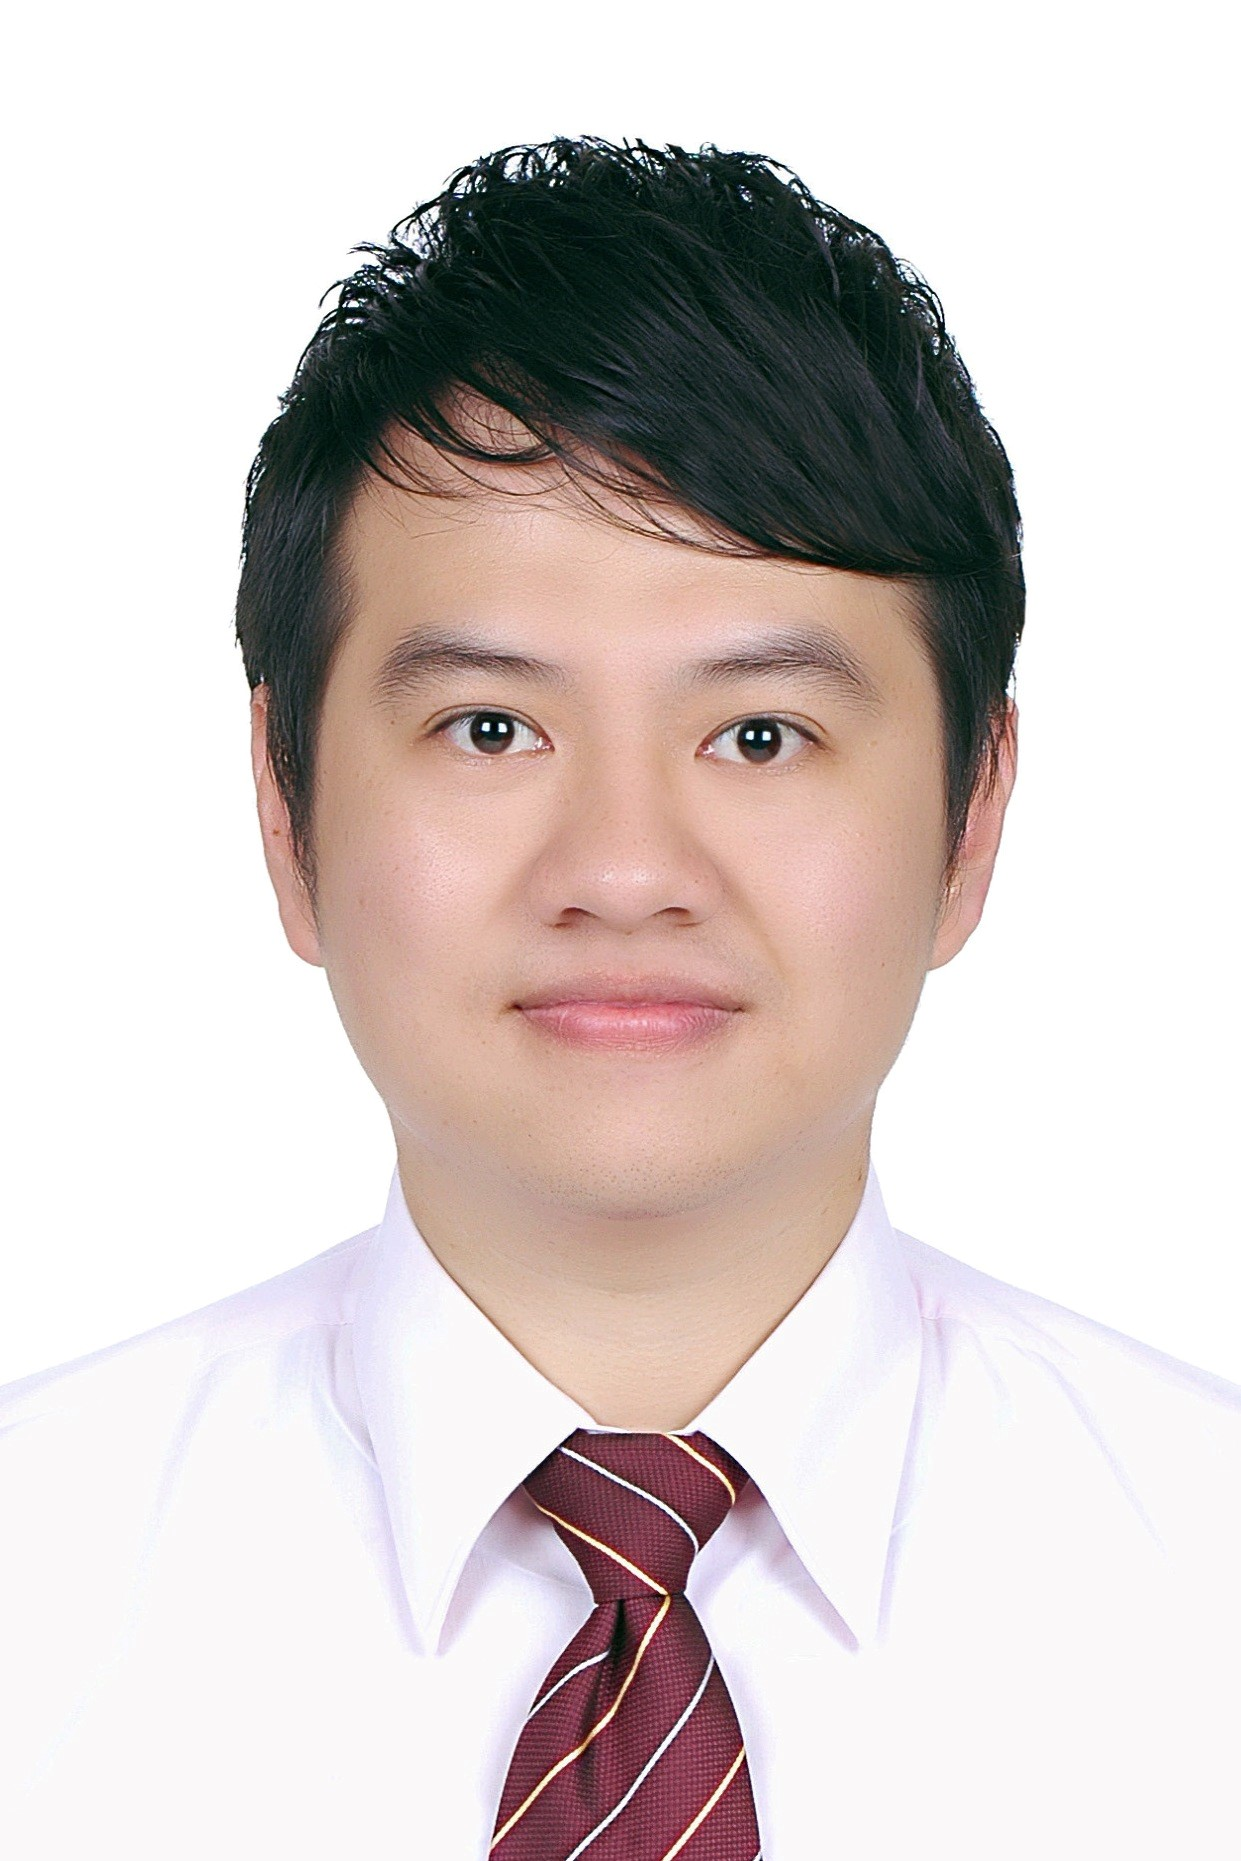 Lu (Mark) Hsueh-lung